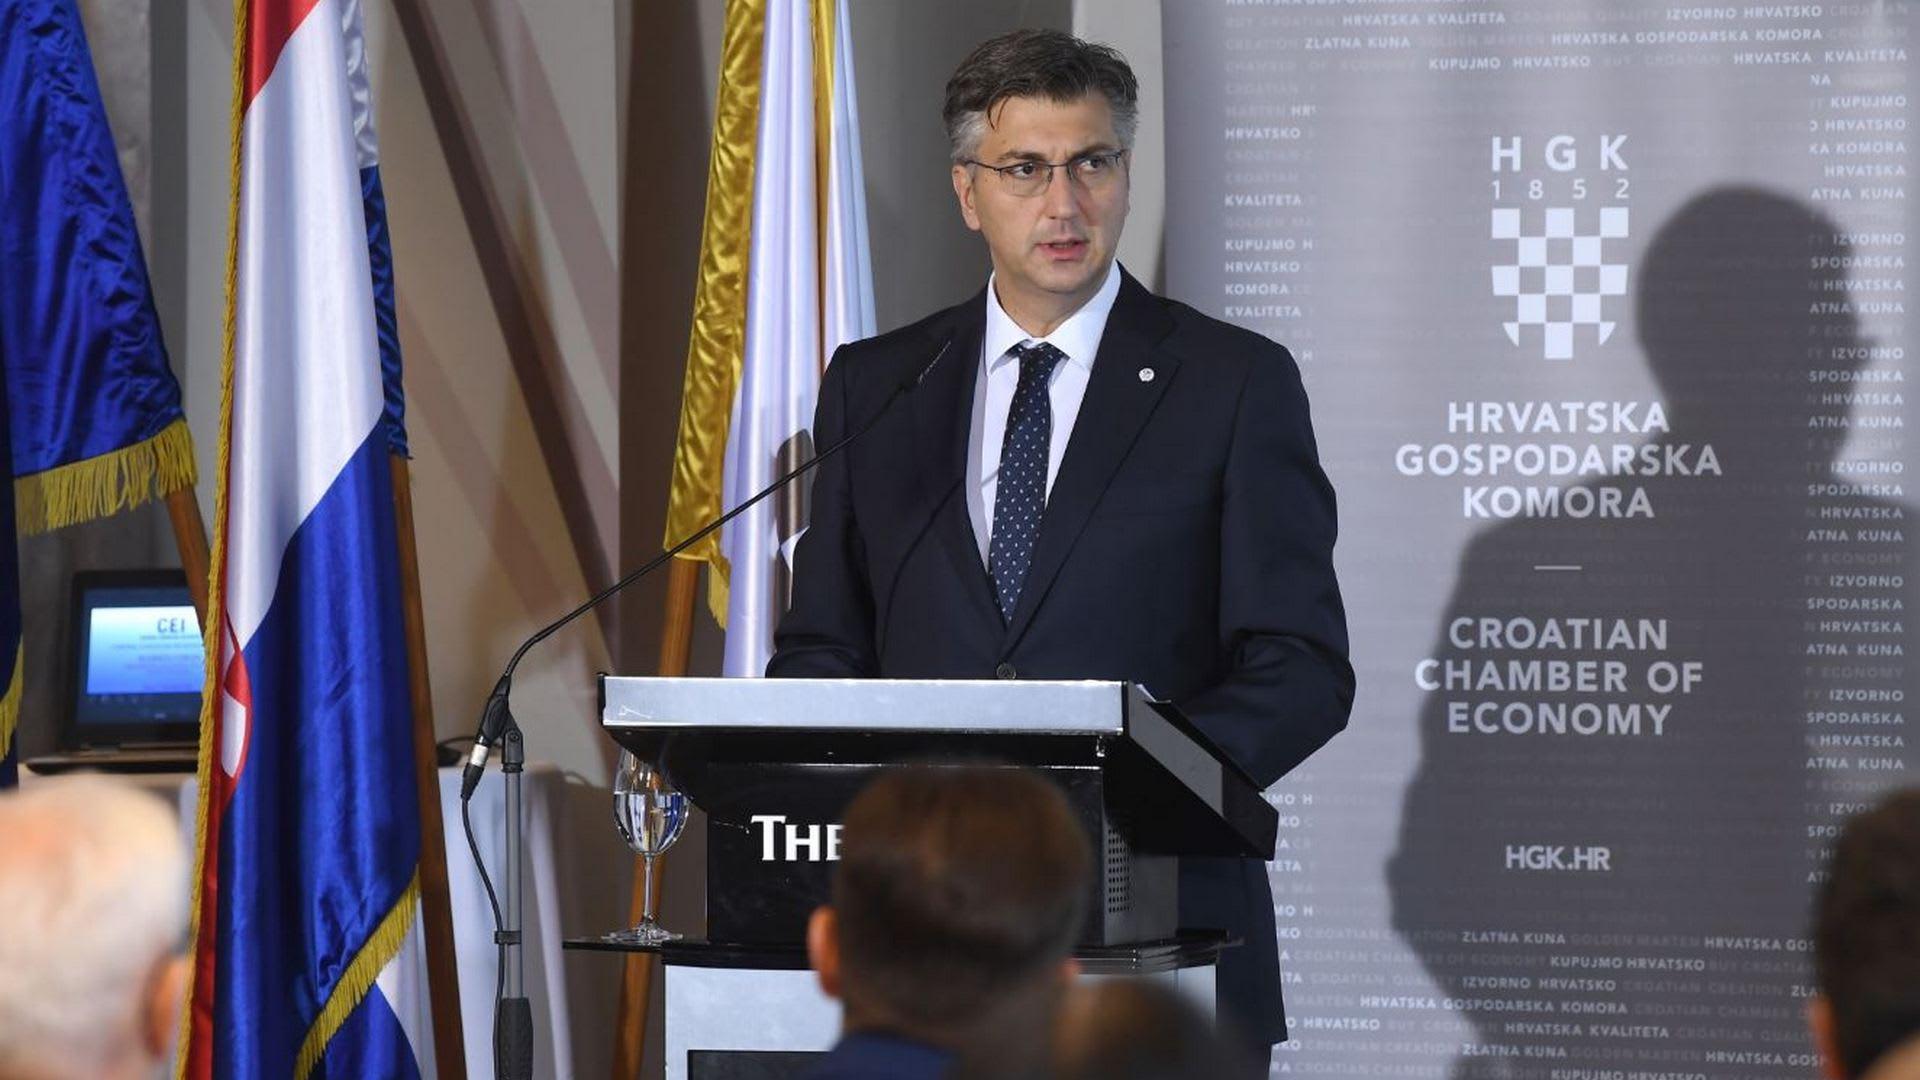 El Primer Ministro Andrej Plenkovic inagurando el Foro. (Foto: Marko Lukunic/PIXSELL)